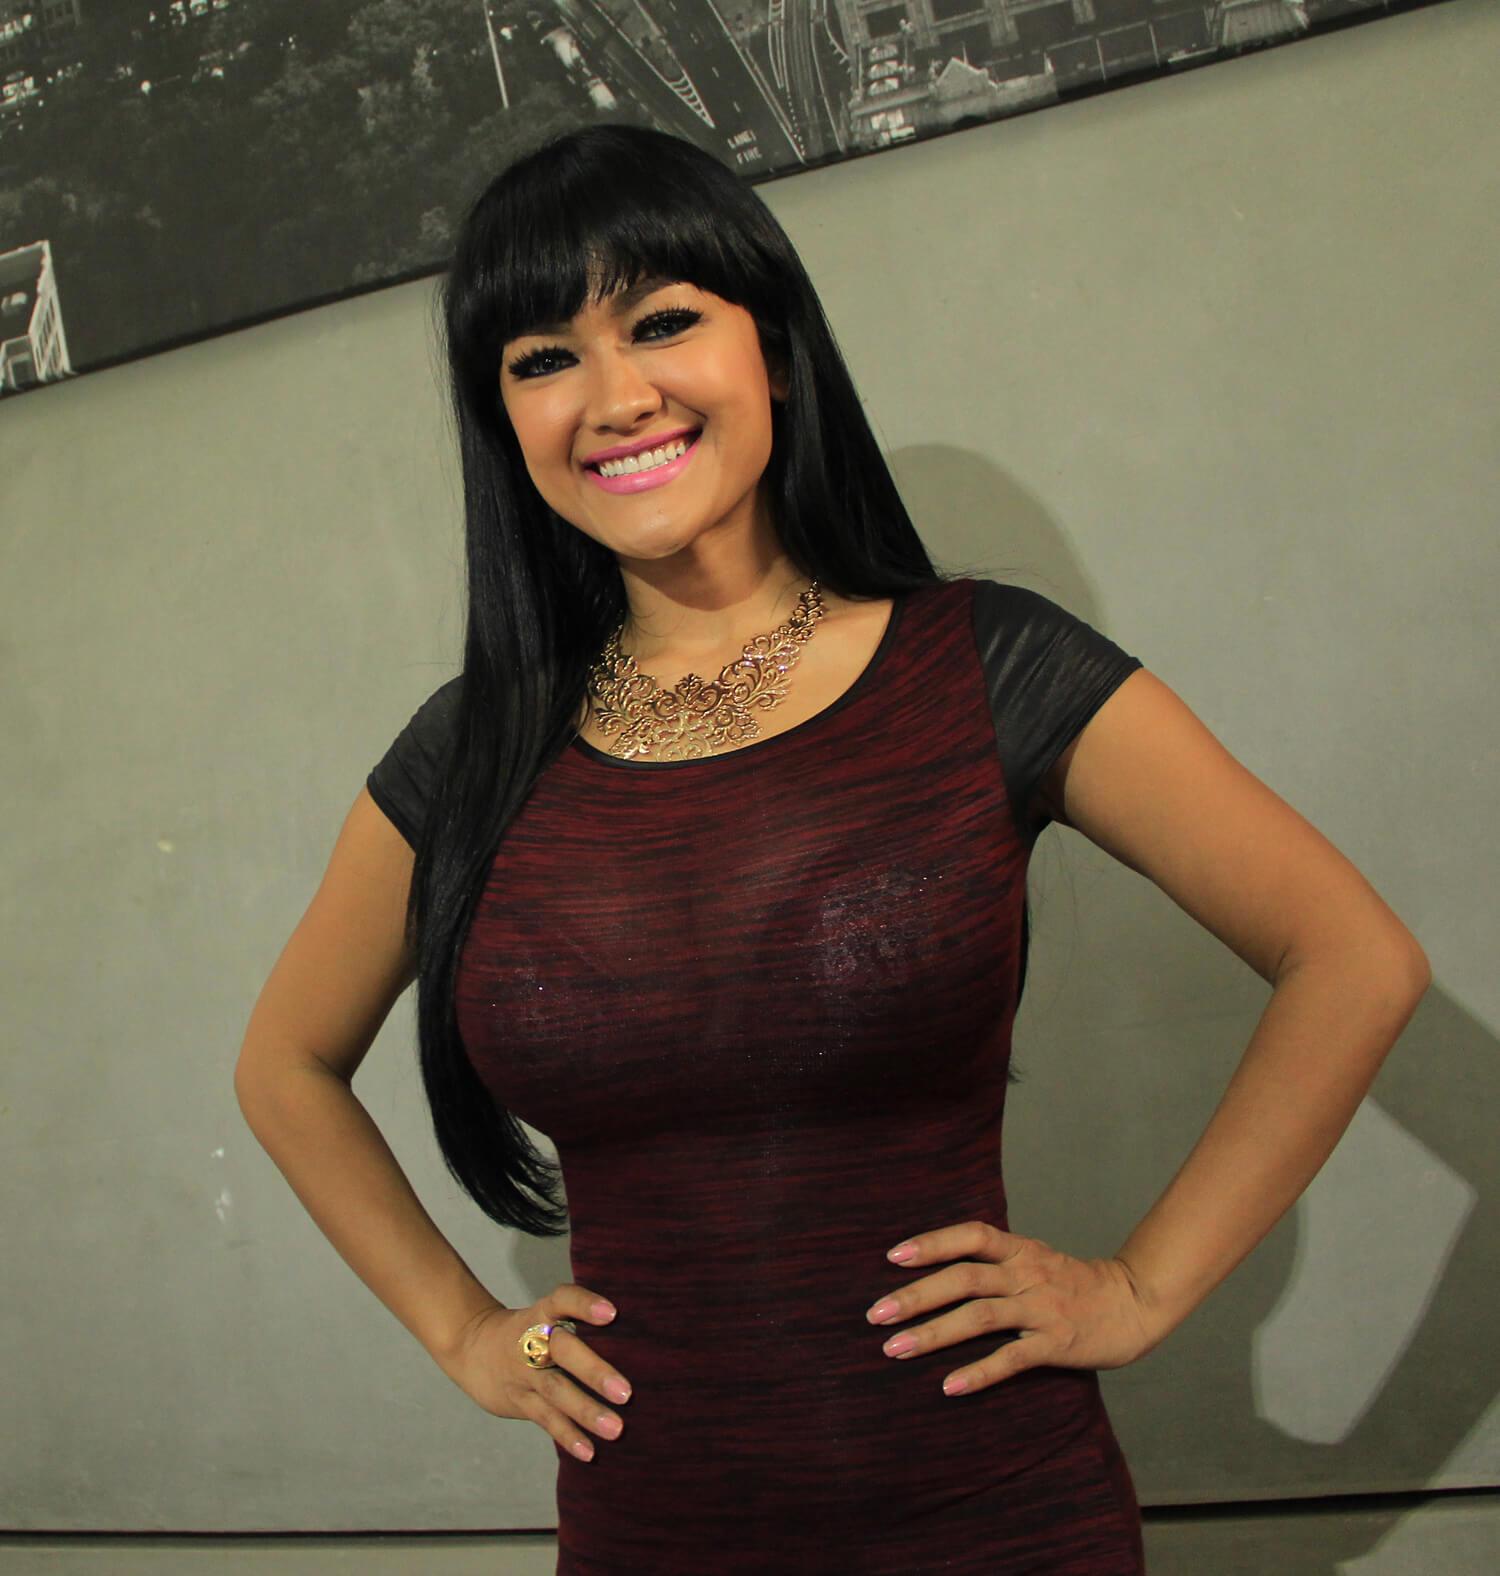 Jupe Julia Perez